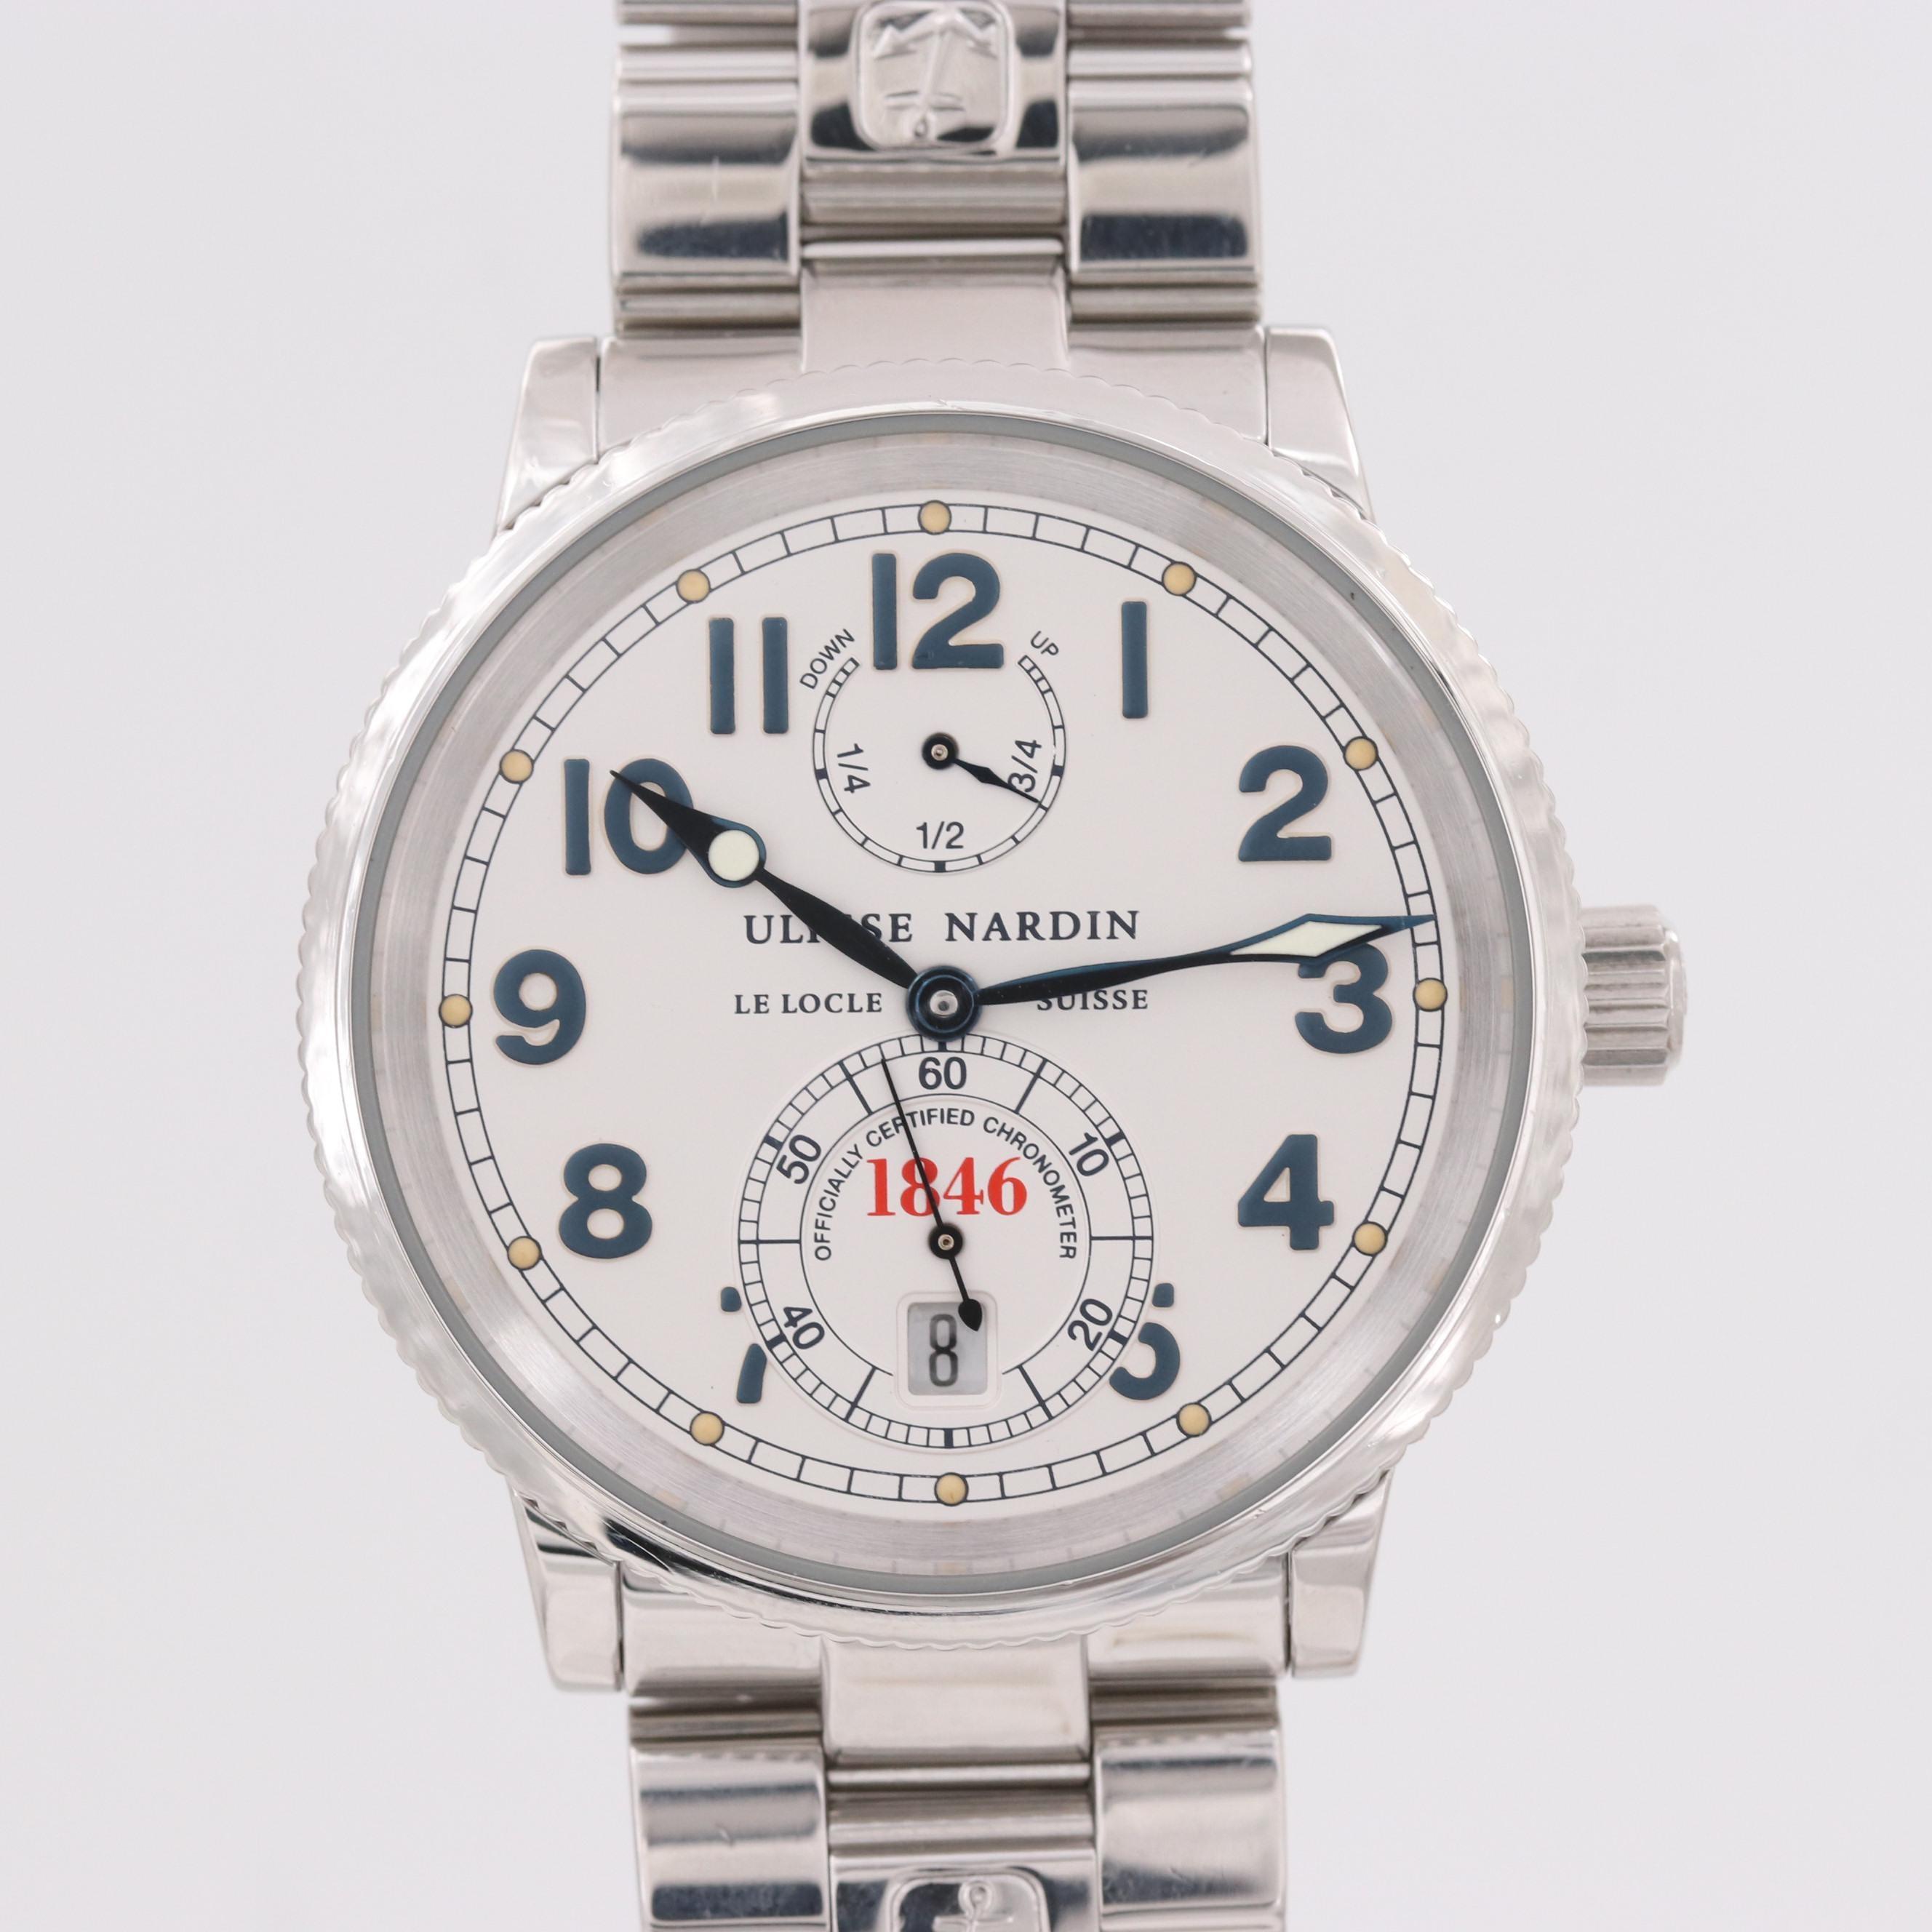 Ulysse Nardin Marine Chronometer Stainless Steel Automatic Wristwatch,Circa 2000